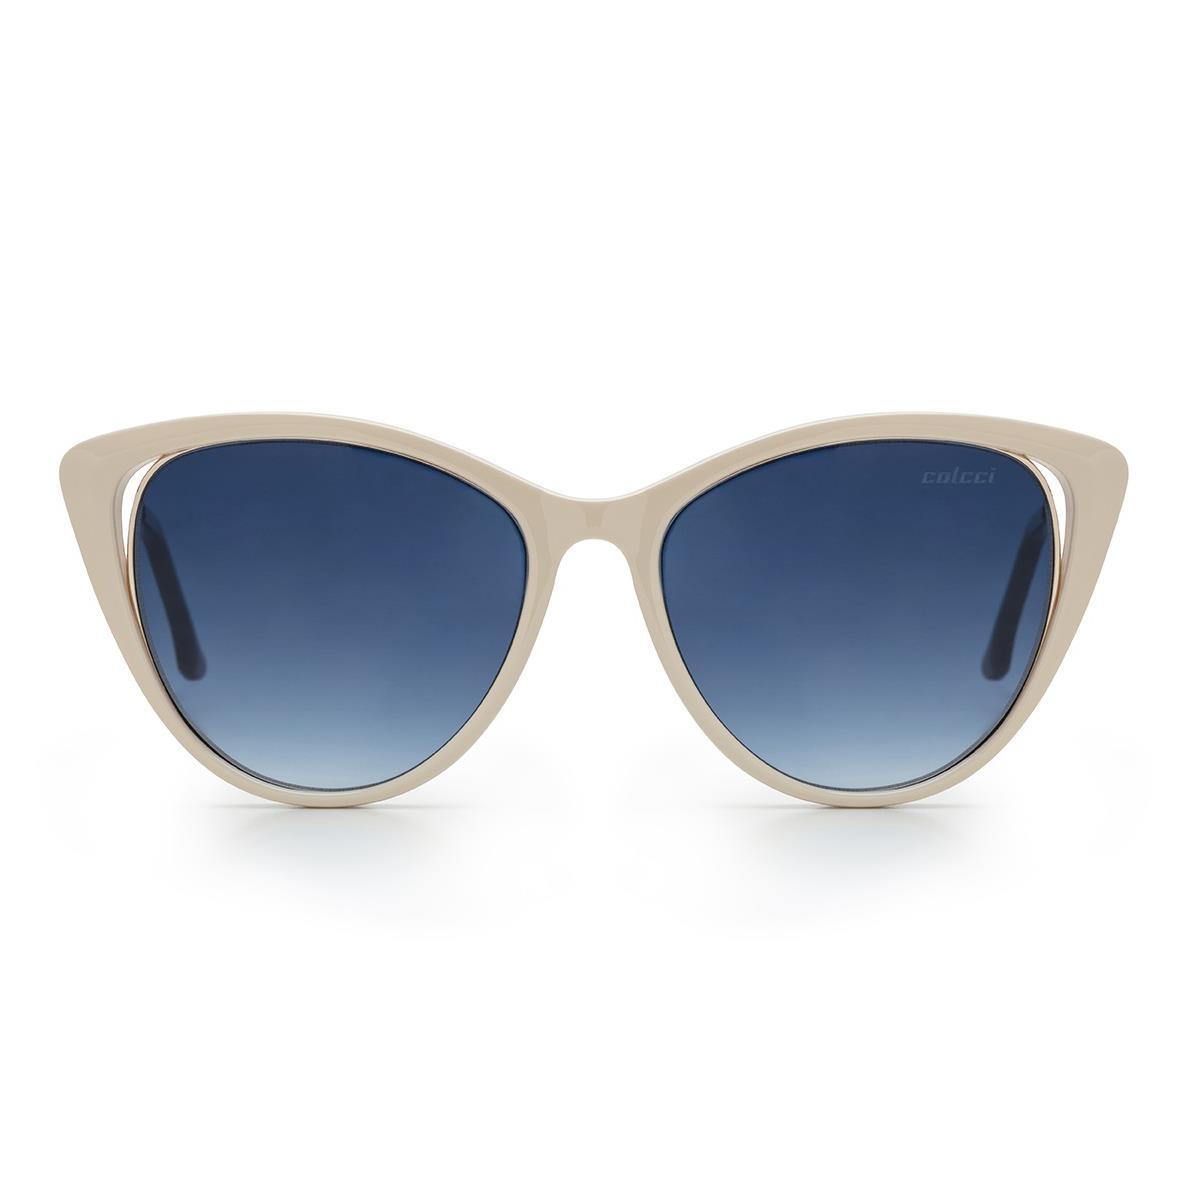 92278d353 Óculos De Sol Colcci Valentina C0123 Branco Off White Lente Azul na  Estrela10